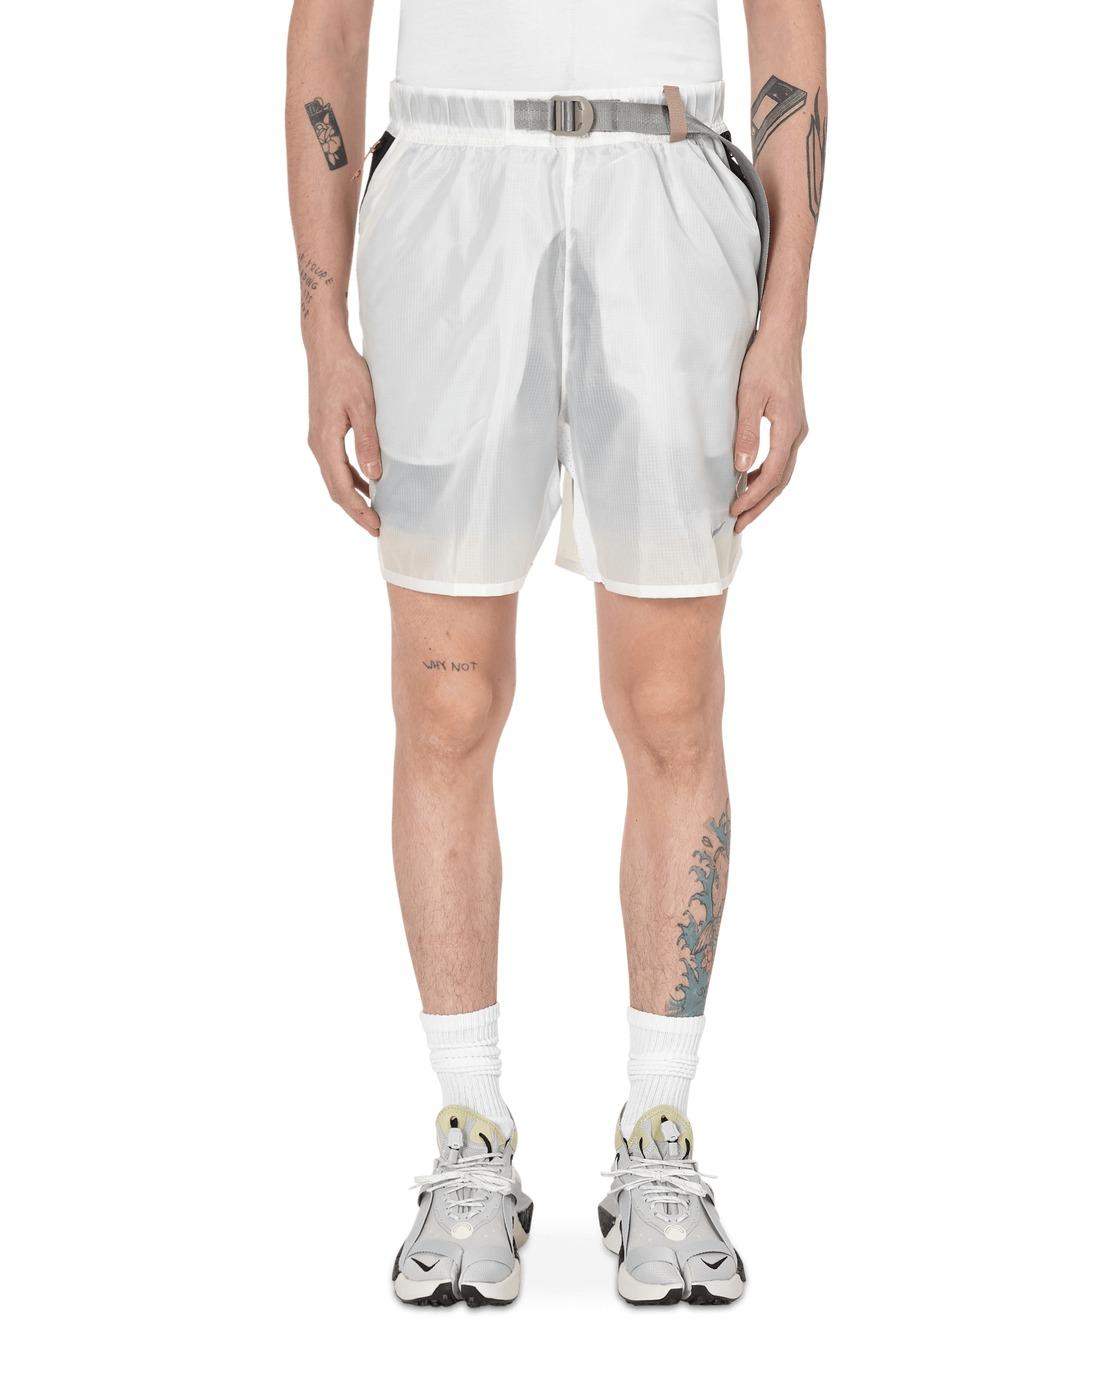 Nike Special Project Nrg Ispa Shorts Sail/Khaki